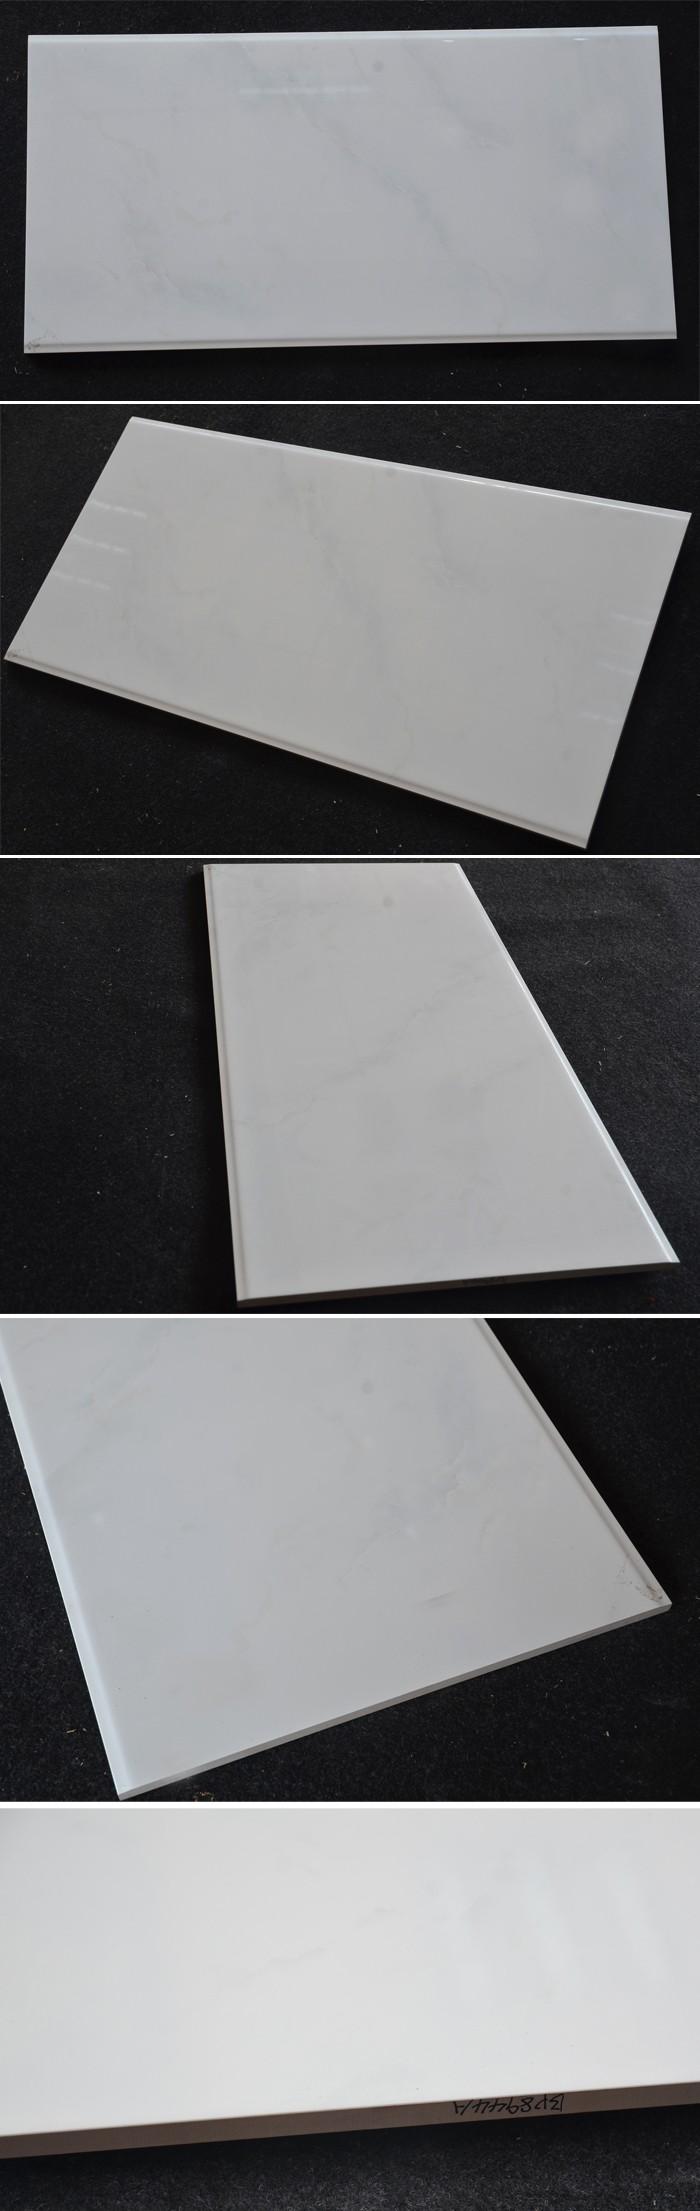 Hm3735la dining room wall ceramic tile 12x18 importers in africa hm3735la dining room wall ceramic tile 12x18 importers in africa dailygadgetfo Image collections